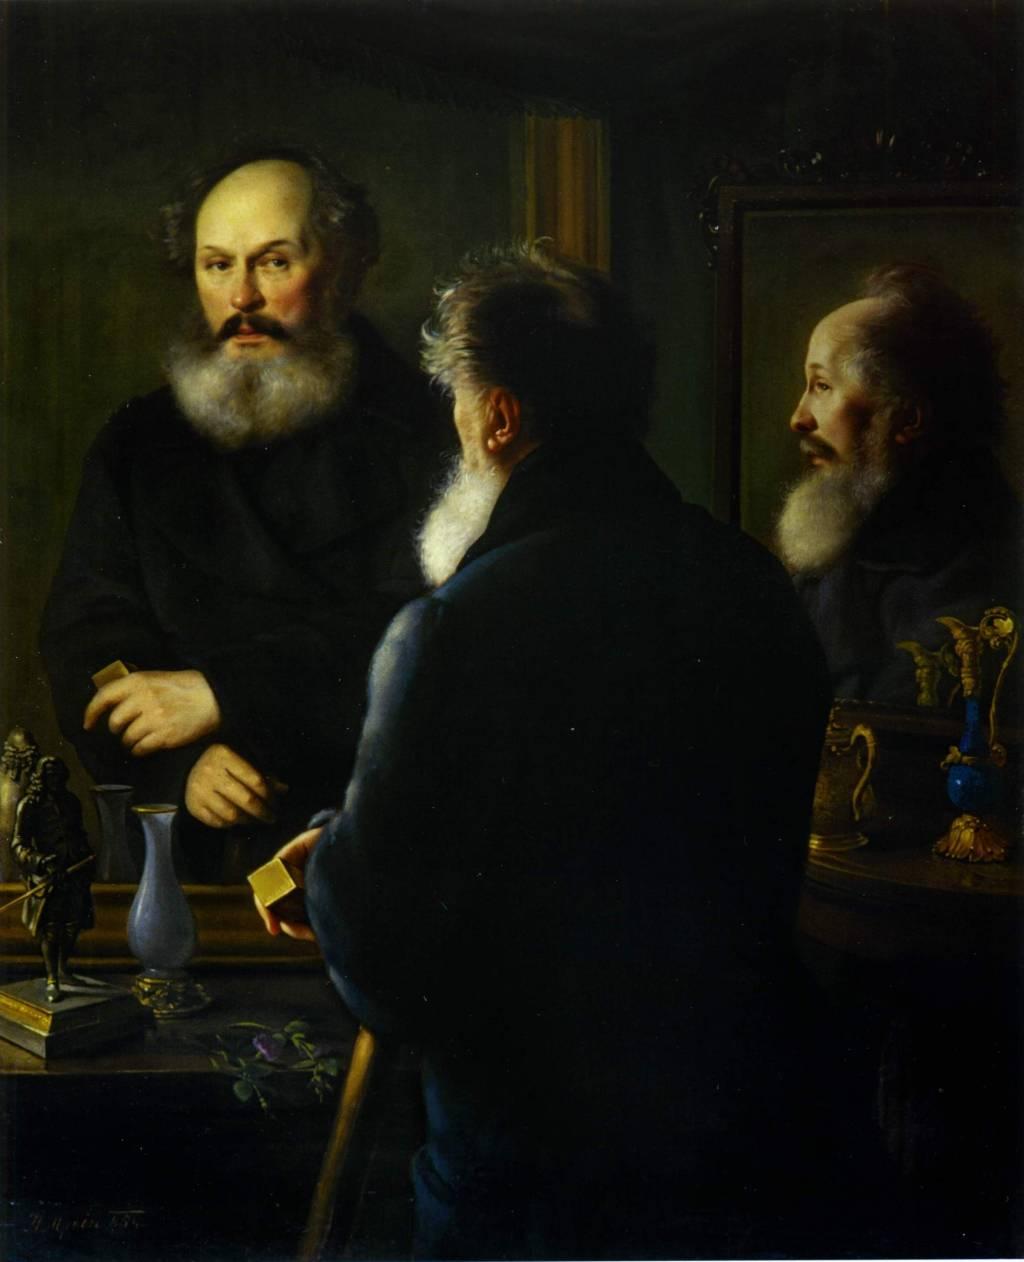 GolpejnportretFilosofova1854.jpg